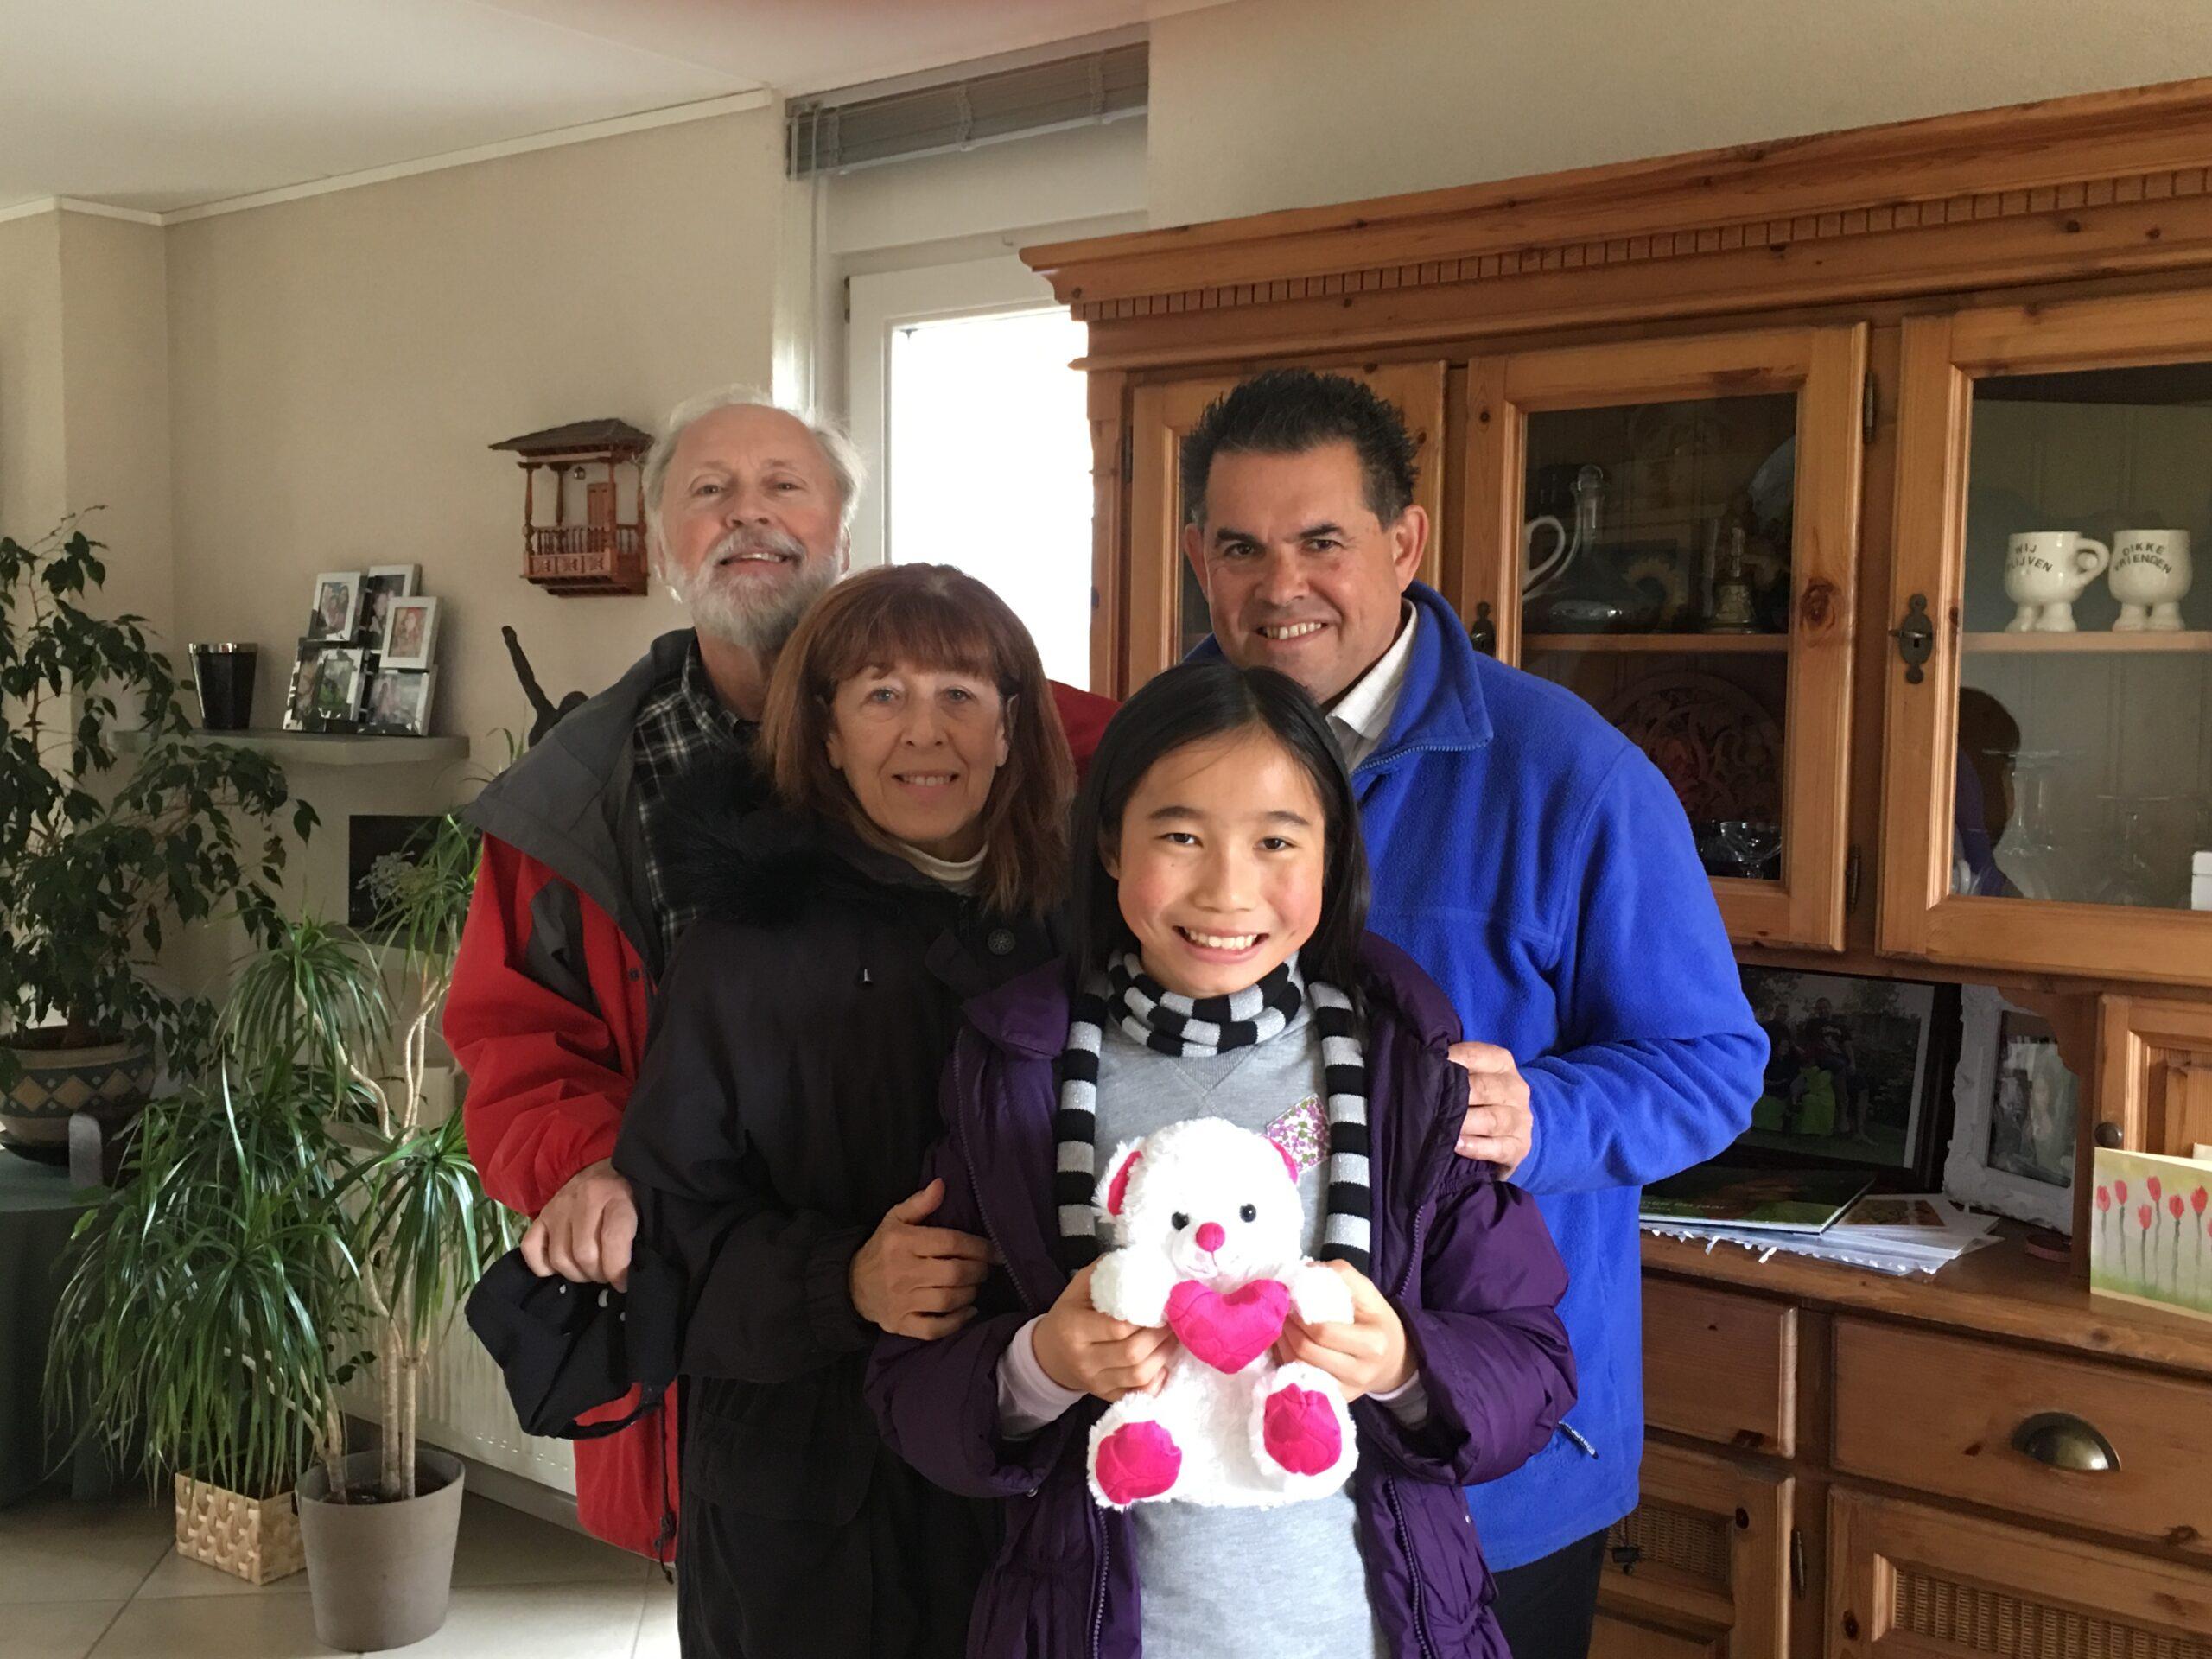 Visiting our good friend Evangelist Jaap Dieleman in the Netherlands